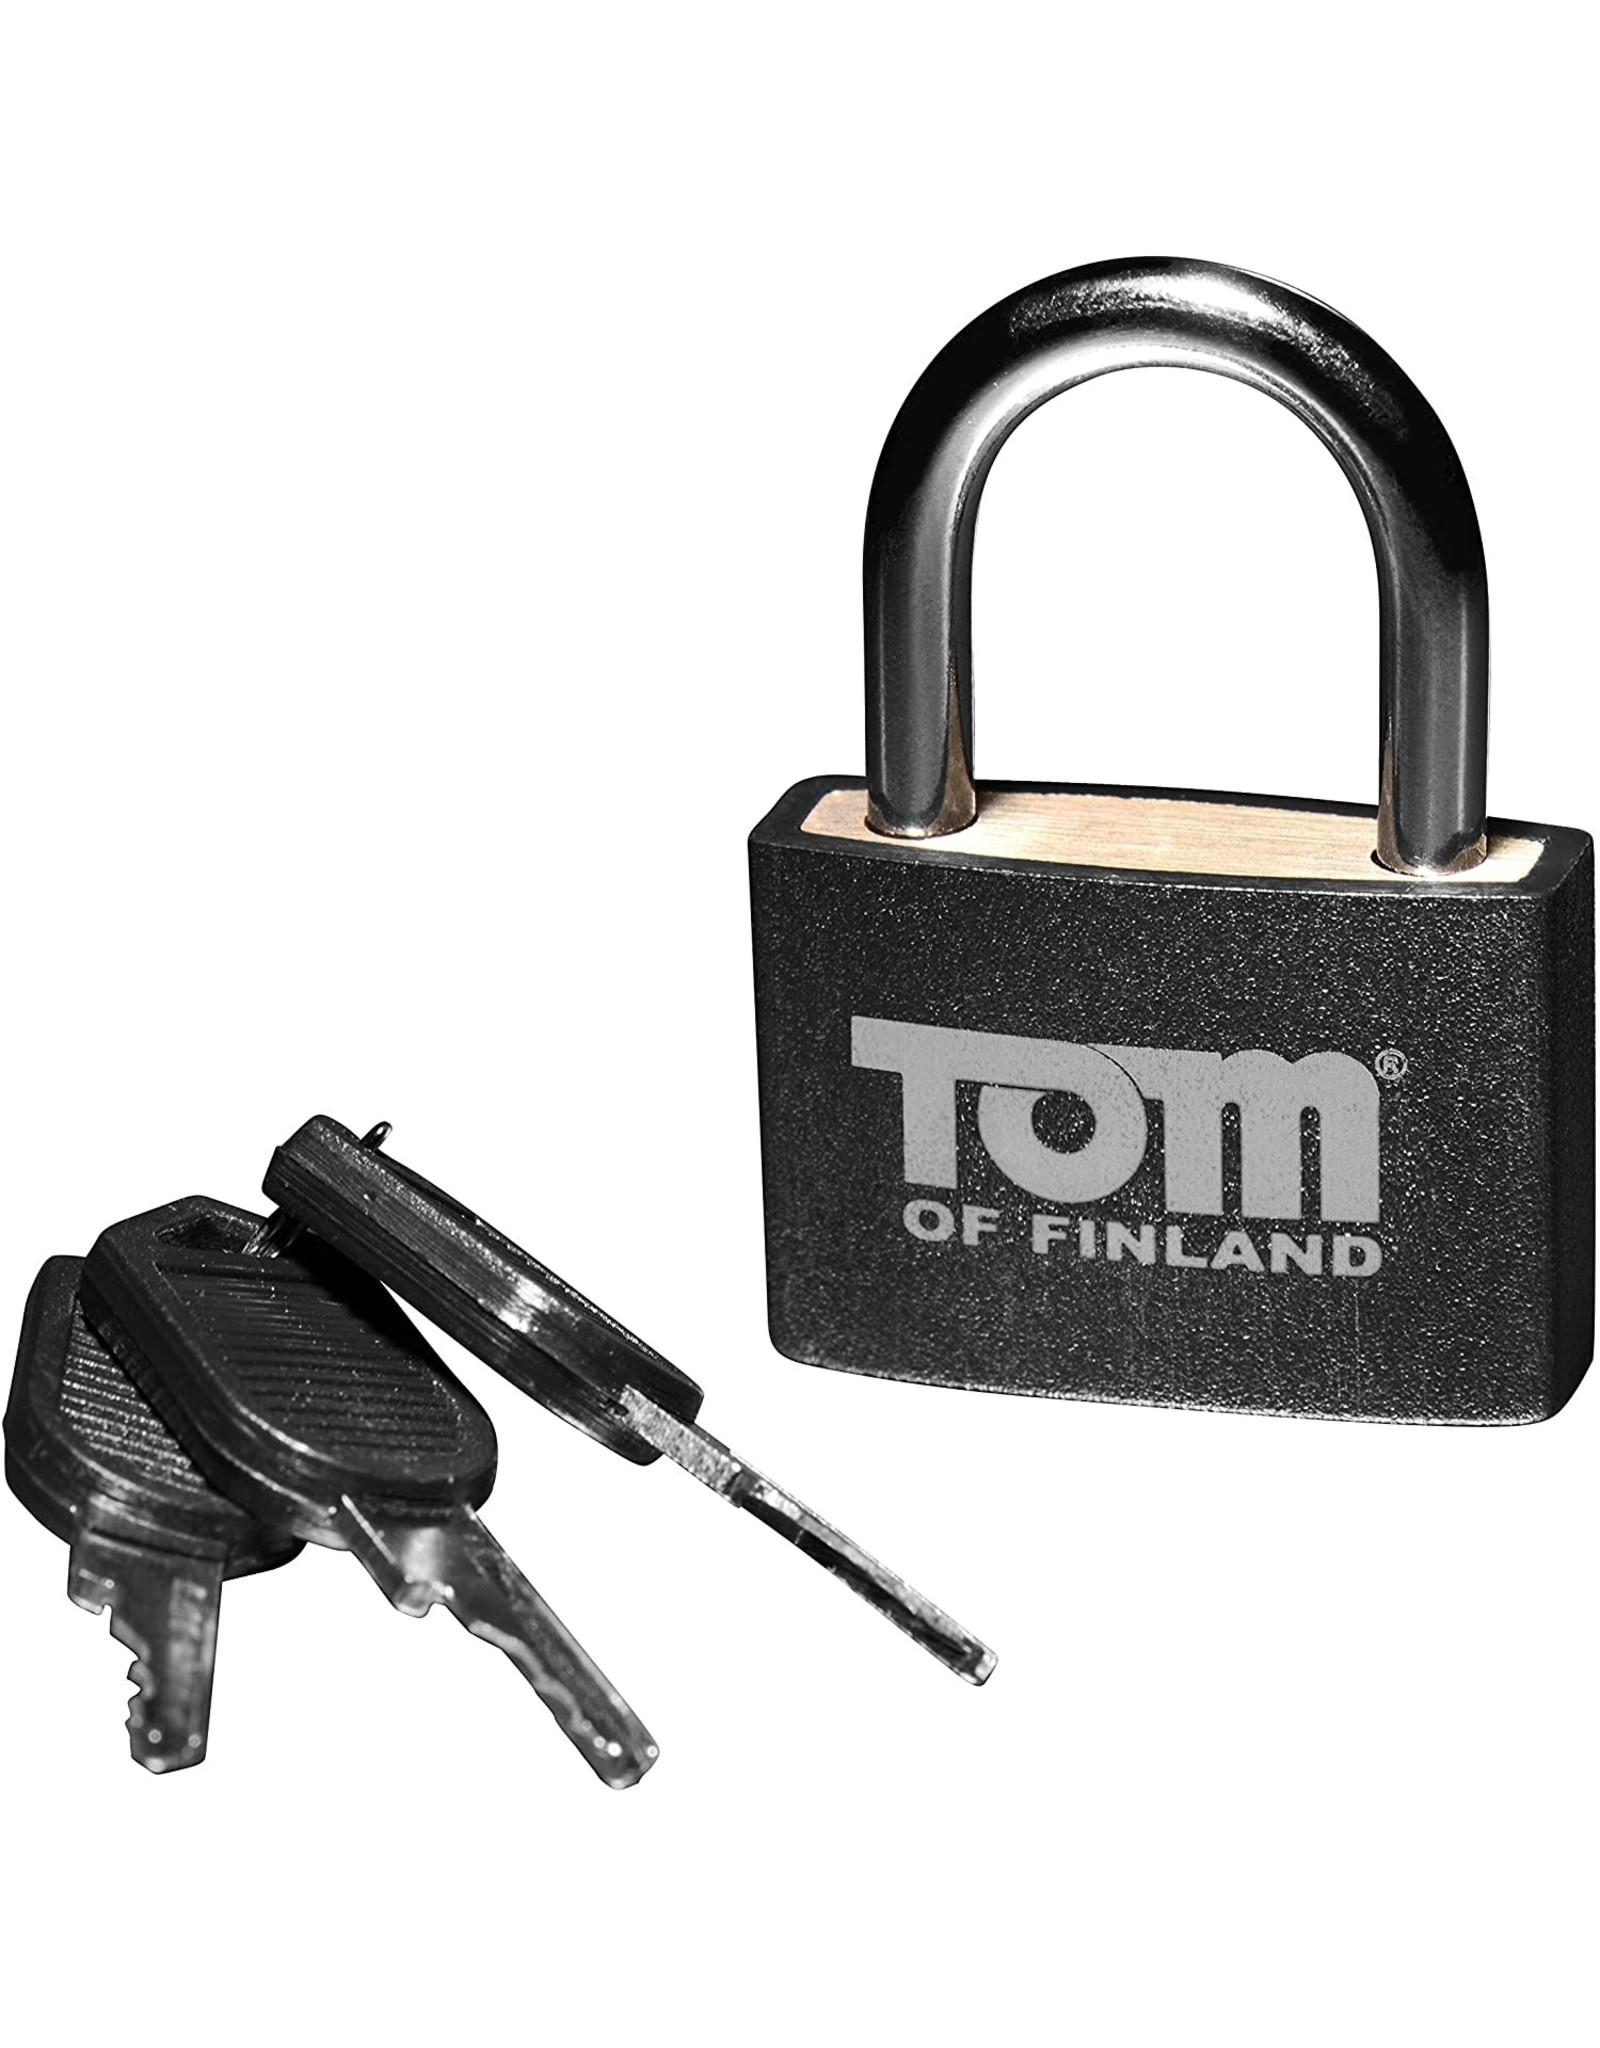 Tom of Finland Tom of Finland Lock